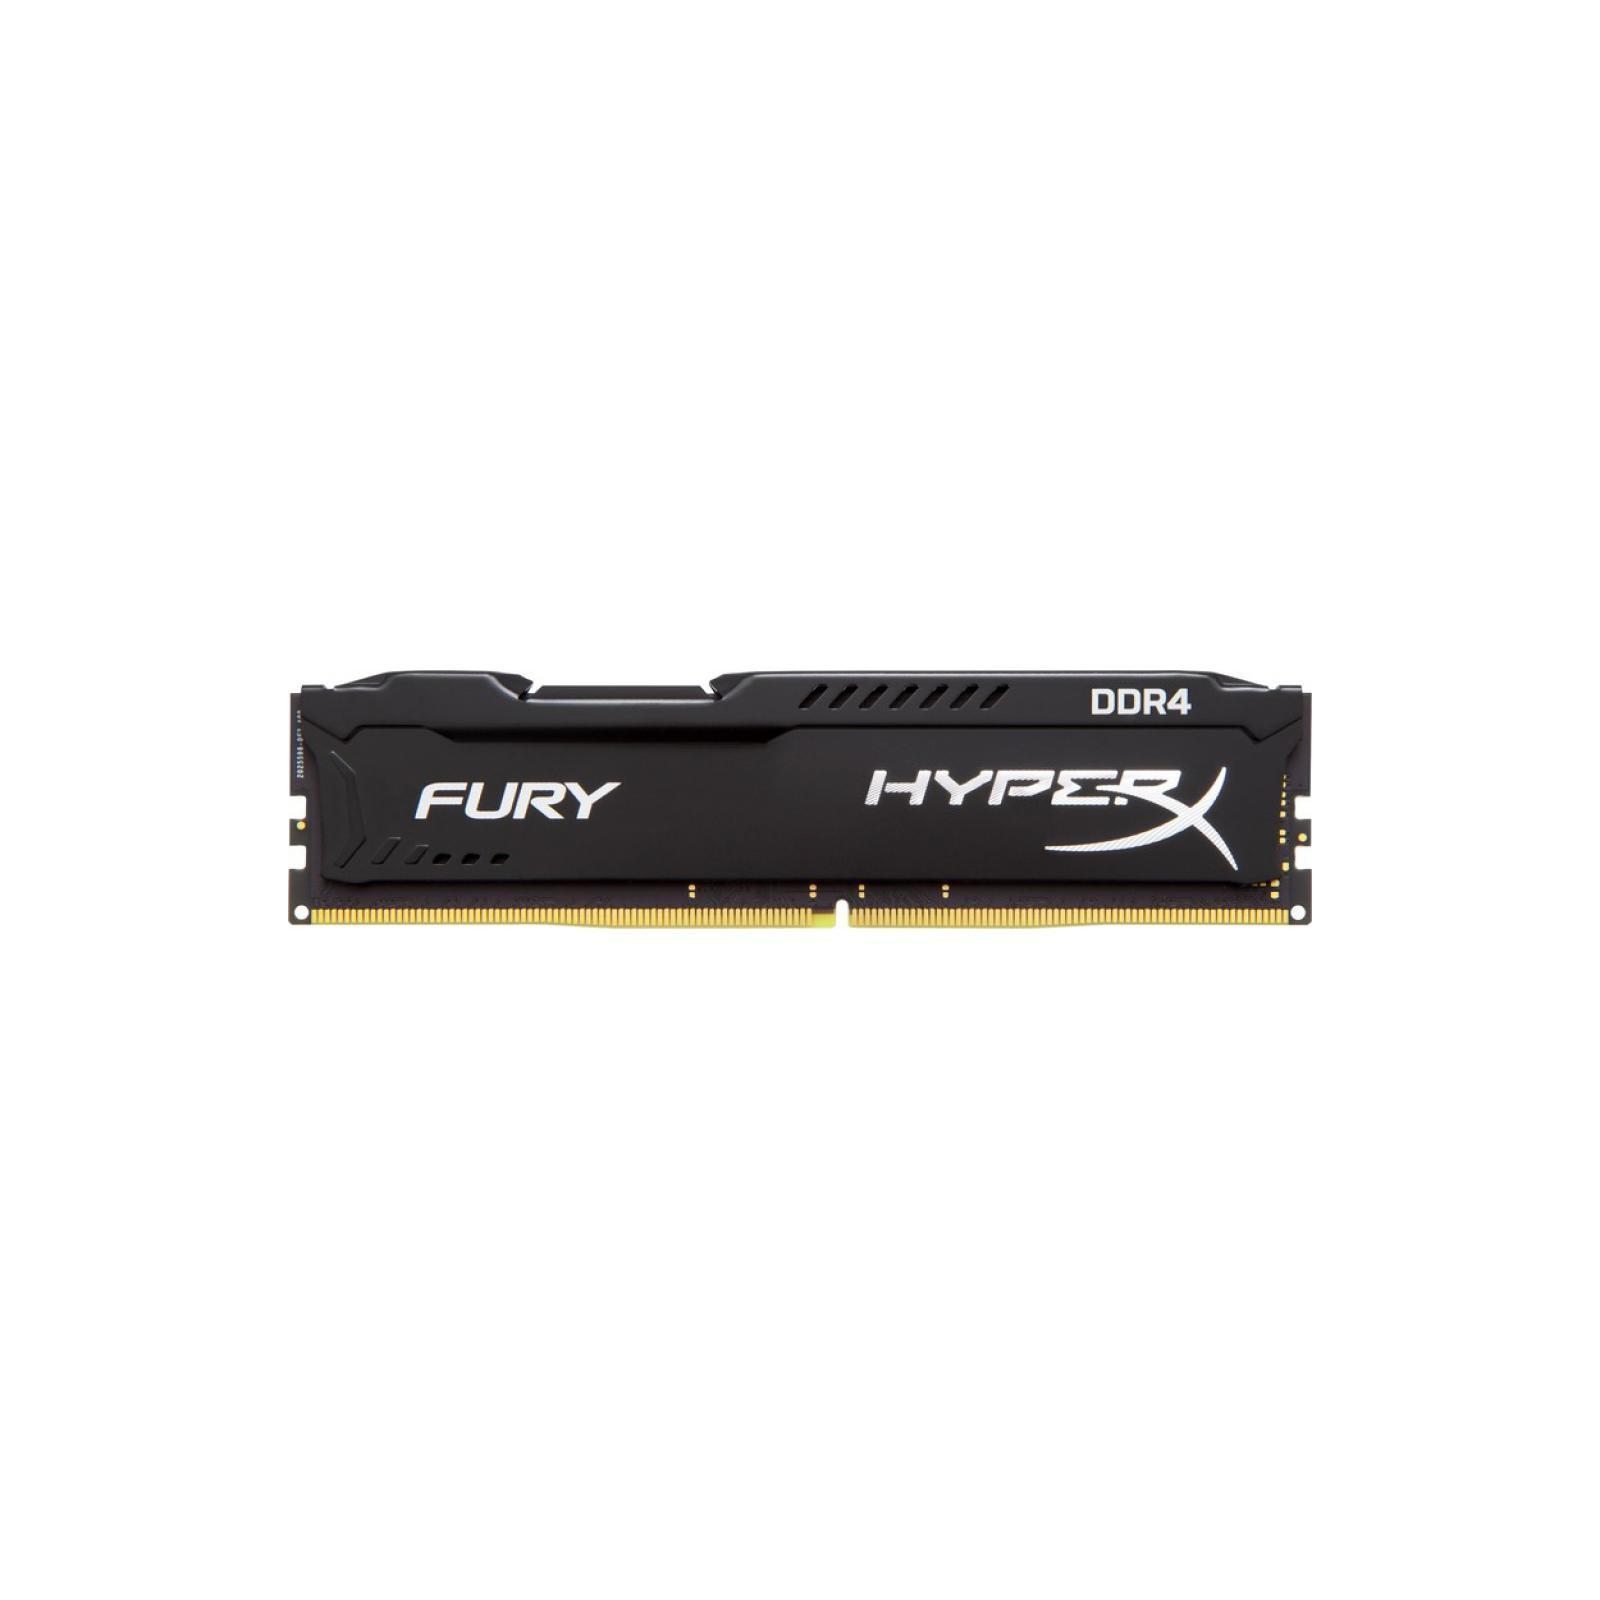 Модуль памяти для компьютера DDR4 16GB 3466 MHz HyperX FURY Black HyperX (Kingston Fury) (HX434C19FB/16)